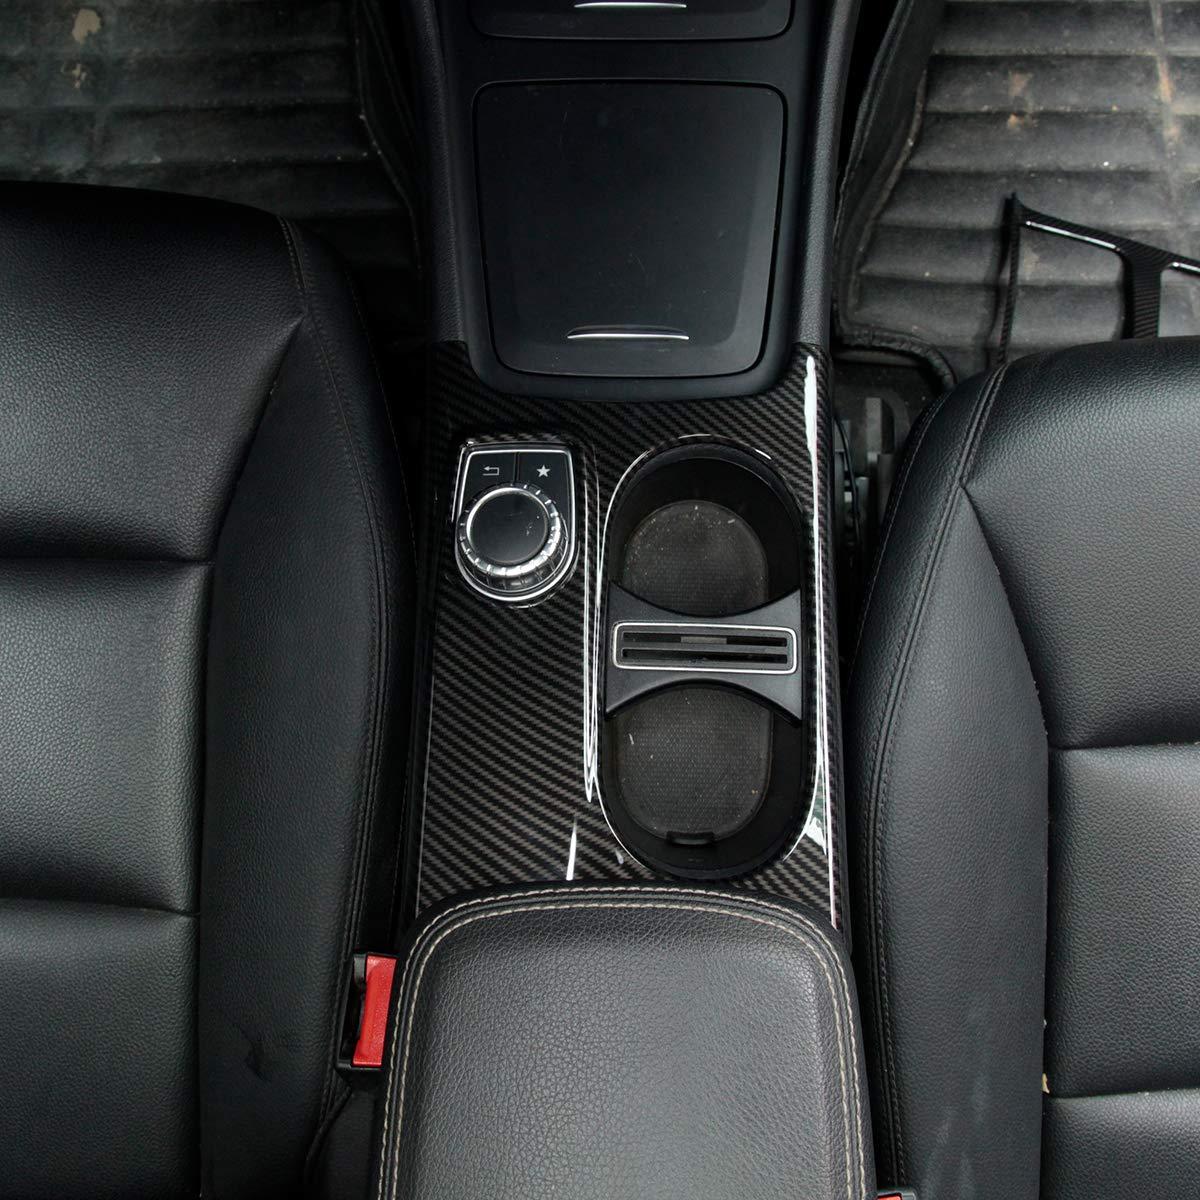 Yiwang accessori auto guida a sinistra copertura portabicchieri in fibra di carbonio per Benz Classe A//GLA//CLA C117 W117 W176 X156 2012 2018